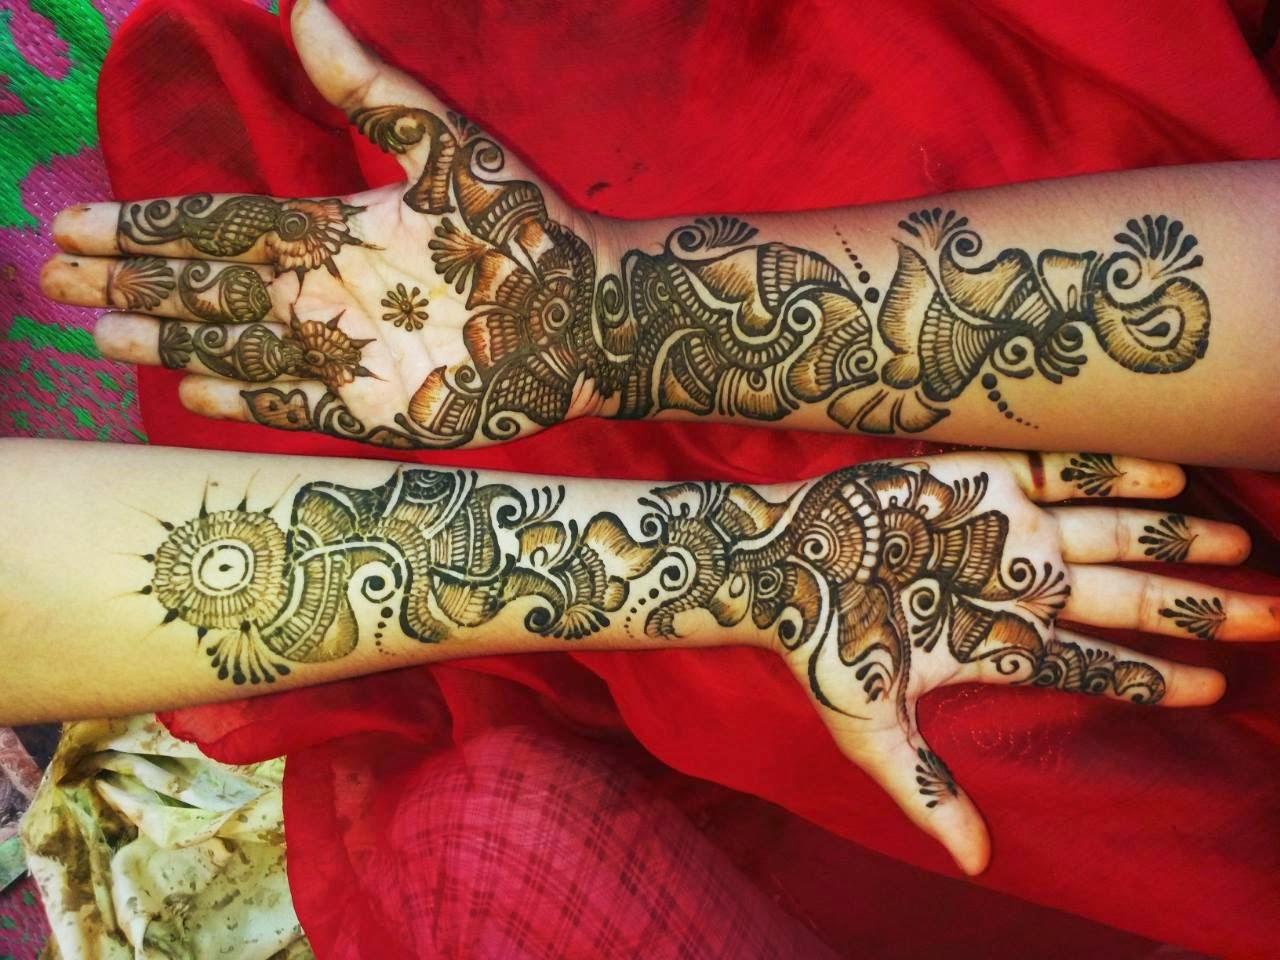 Bridal Mehndi Designs Henna Art Of Mehndi Designs - Arabic Dulhan Mehndi Design , HD Wallpaper & Backgrounds